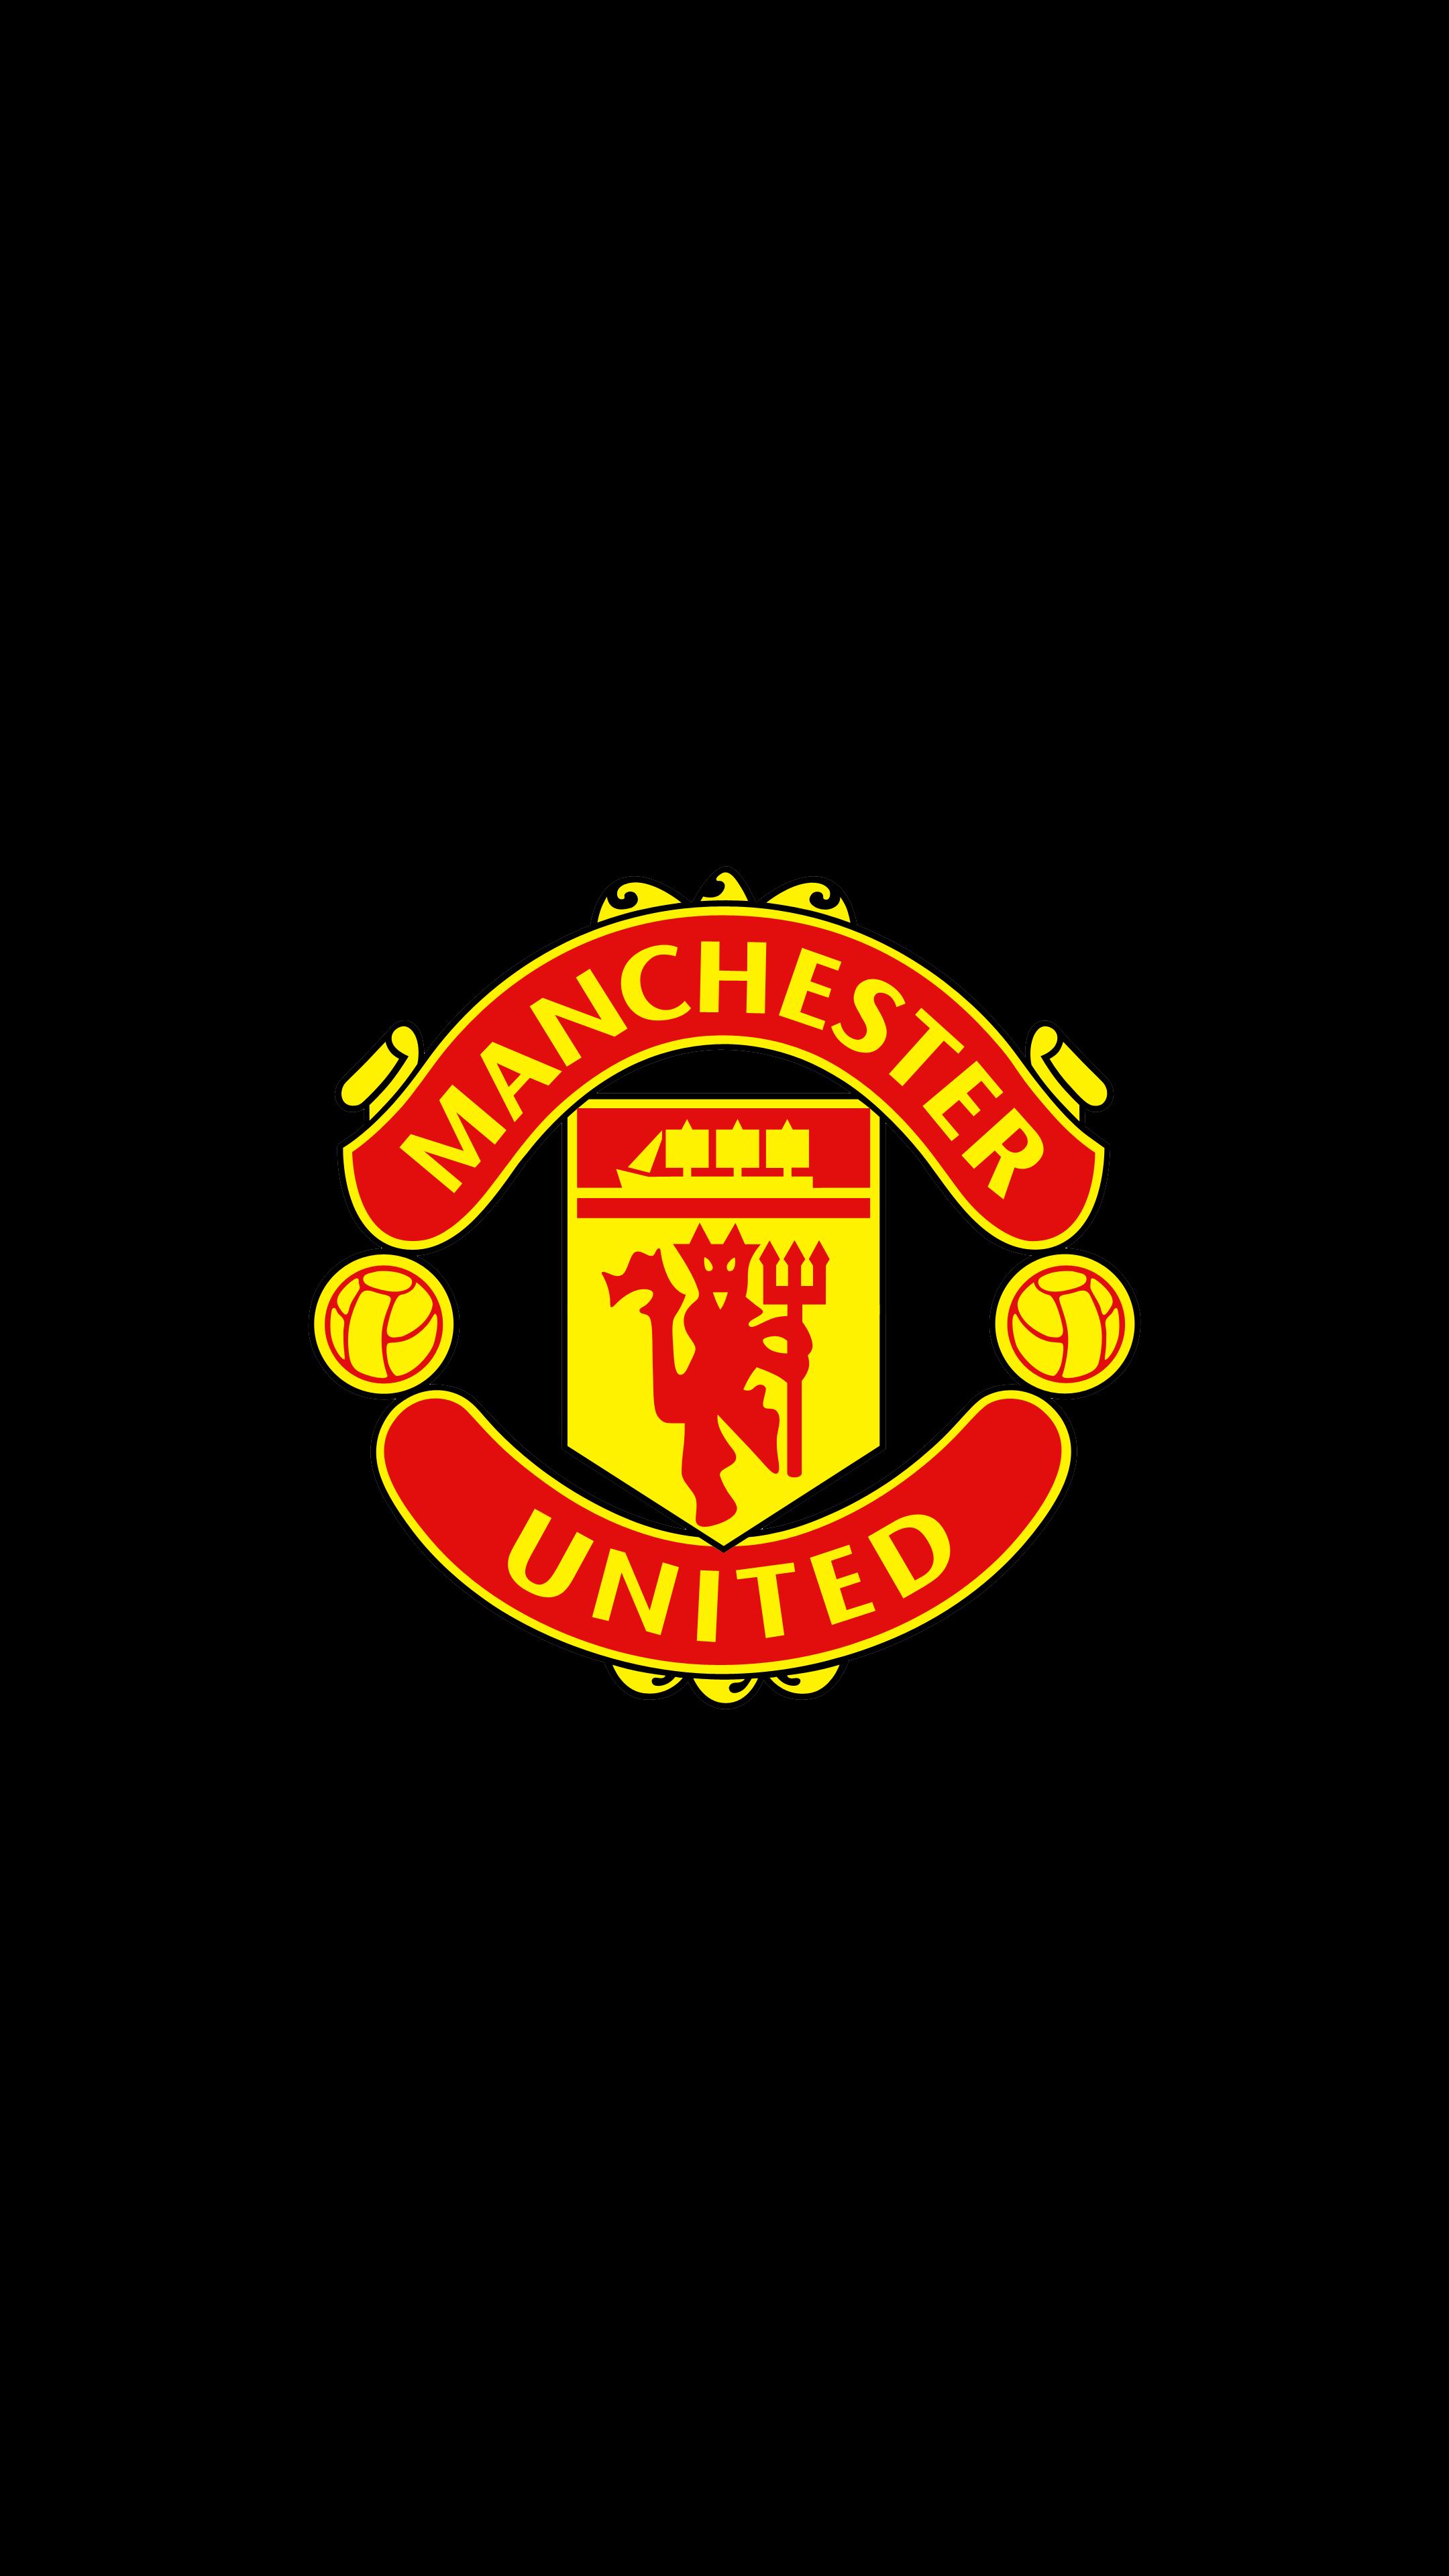 Manchester United Flat 2160p 4k Oled Wallpaper Sepak Bola Olahraga Seni